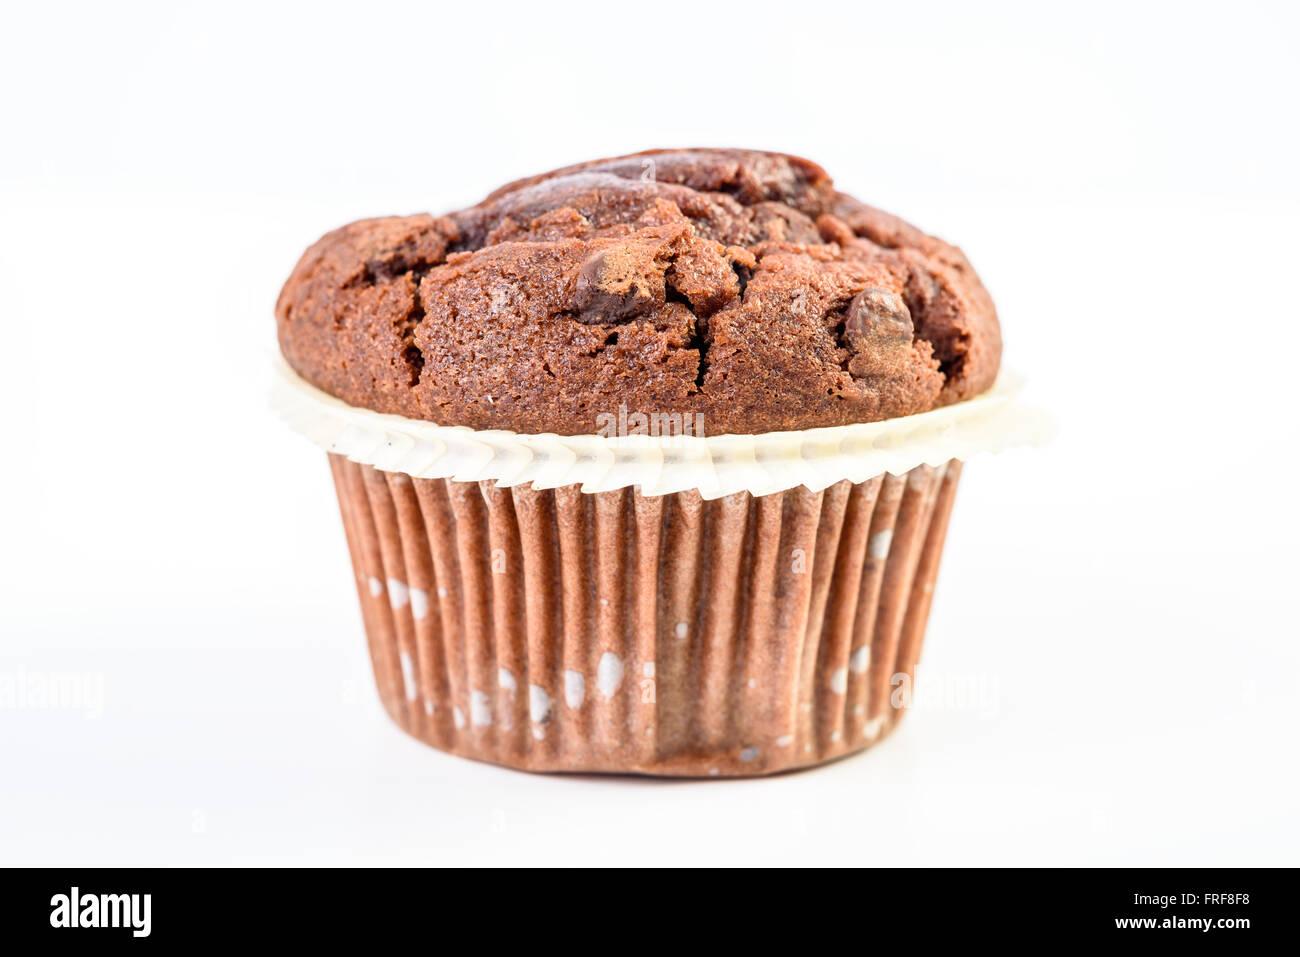 Homemade Chocolate Chip Muffin On White - Stock Image